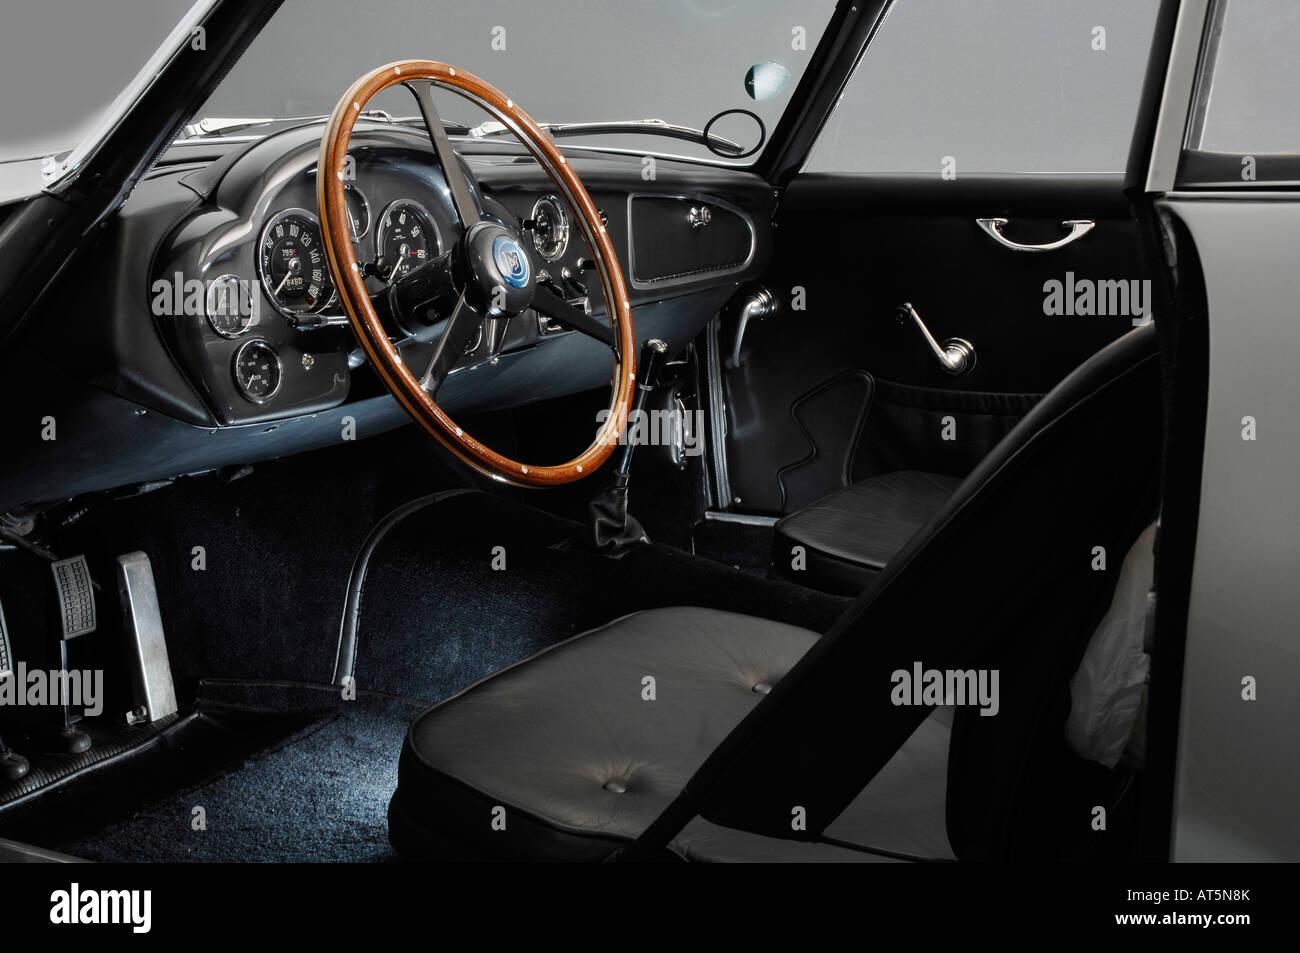 1961 Aston Martin Db4 Gt Zagato Stock Photo Alamy